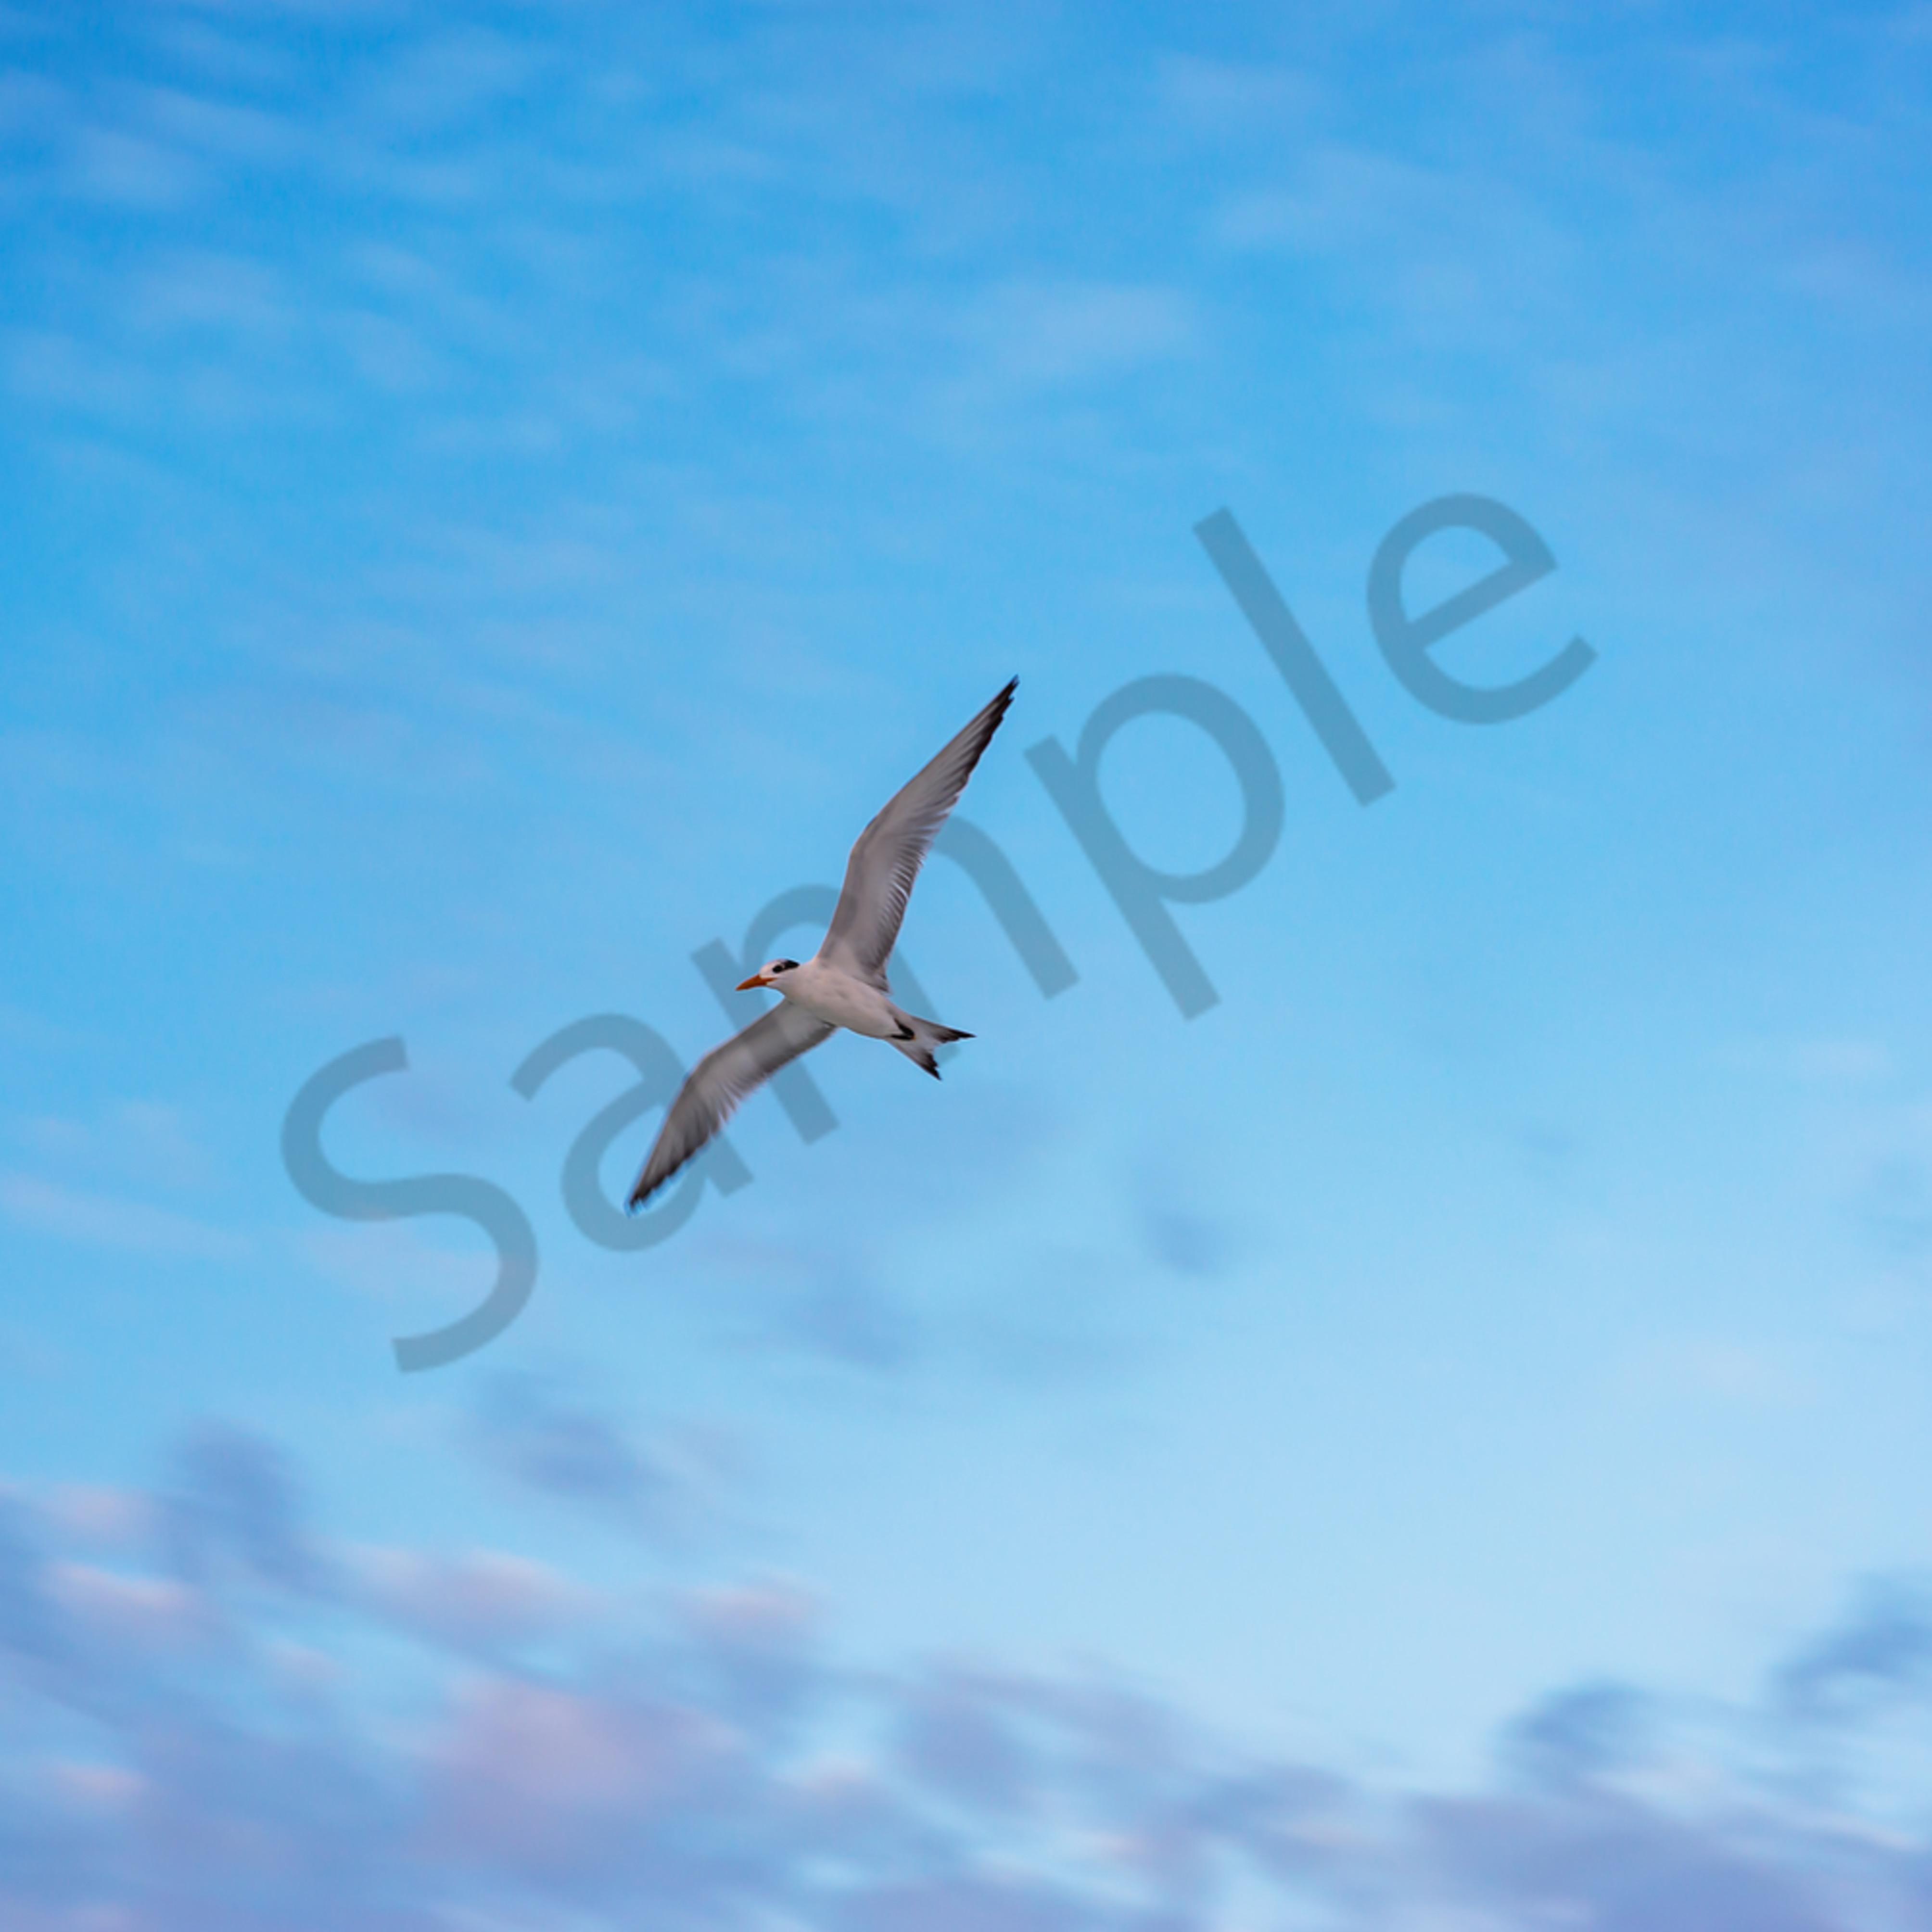 Wheeling and soaring o50ey1